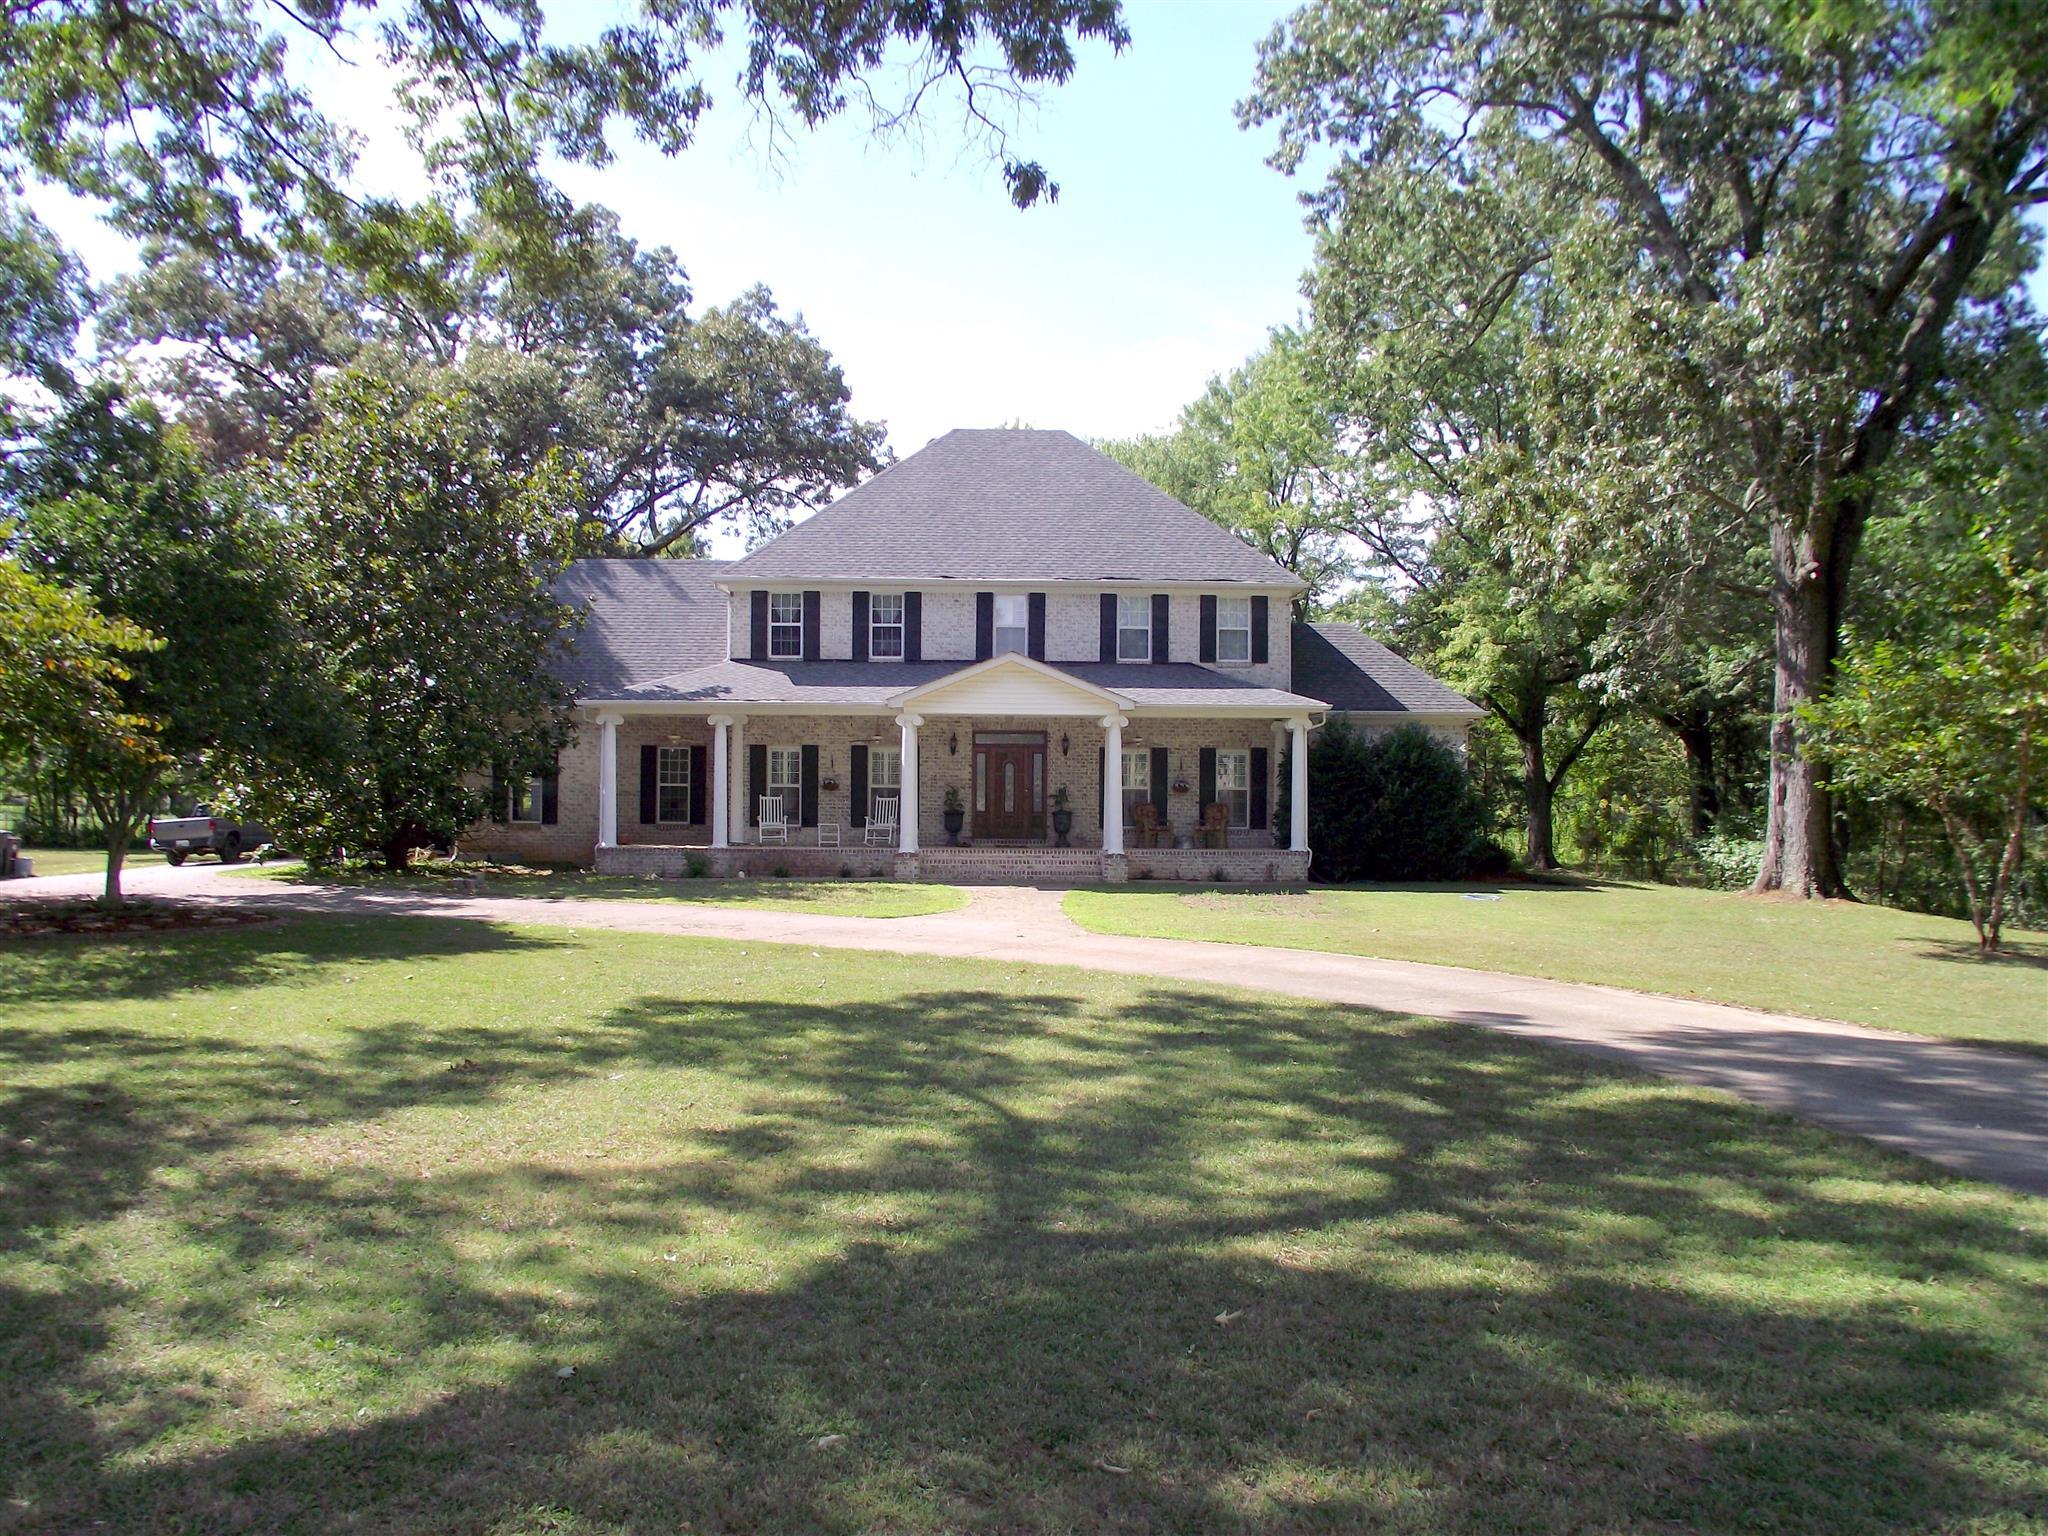 4652 Barfield Crescent Rd, Murfreesboro, TN 37128